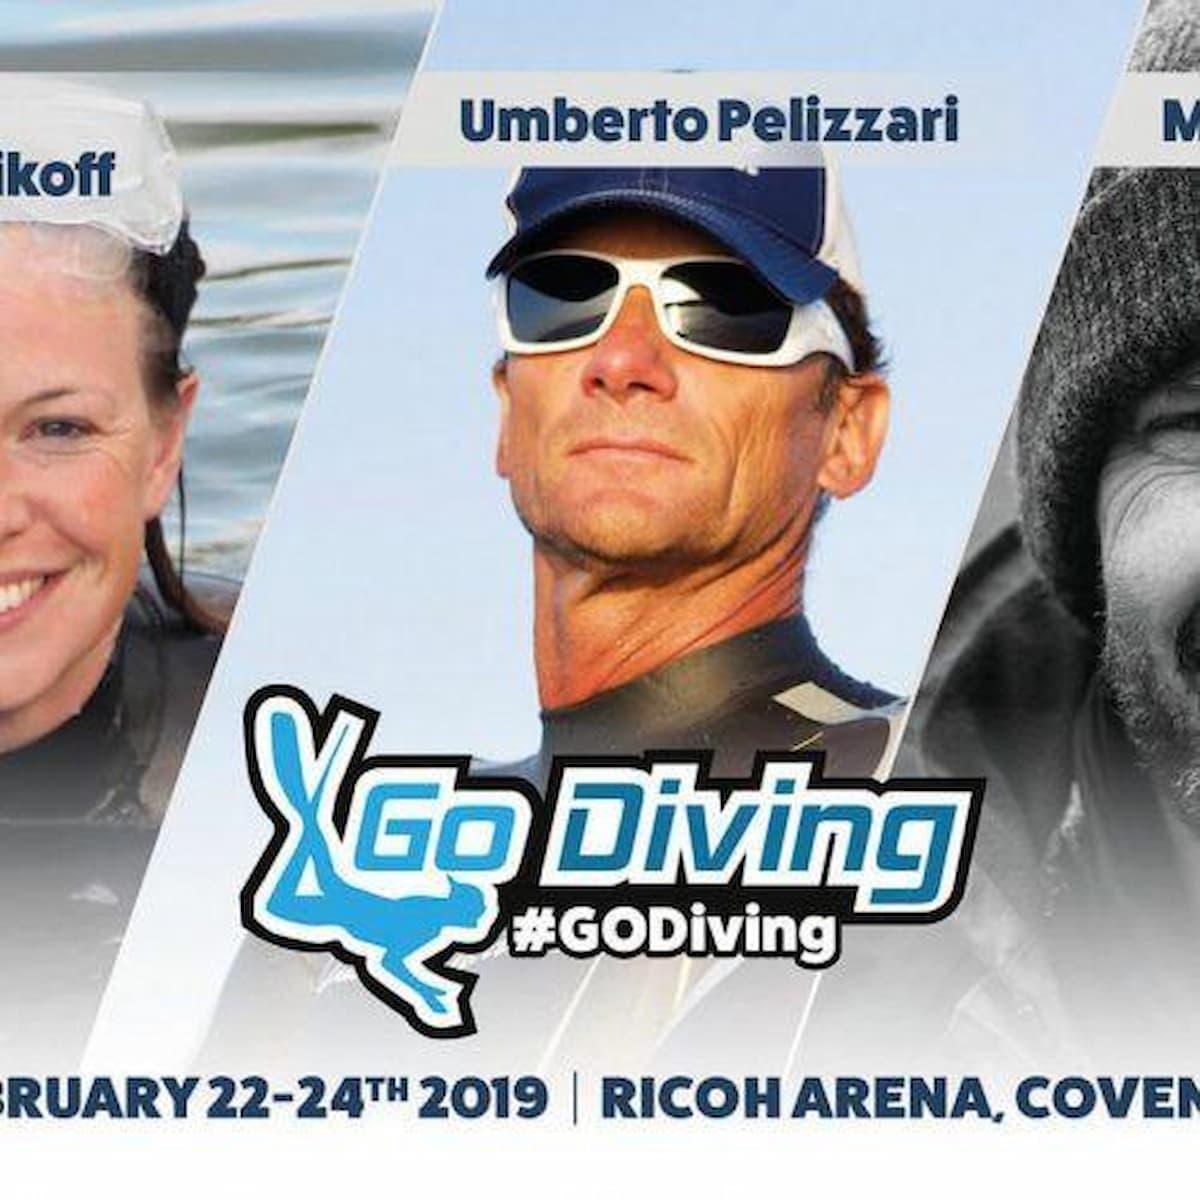 GO Diving Show expands to 6,000 sqm